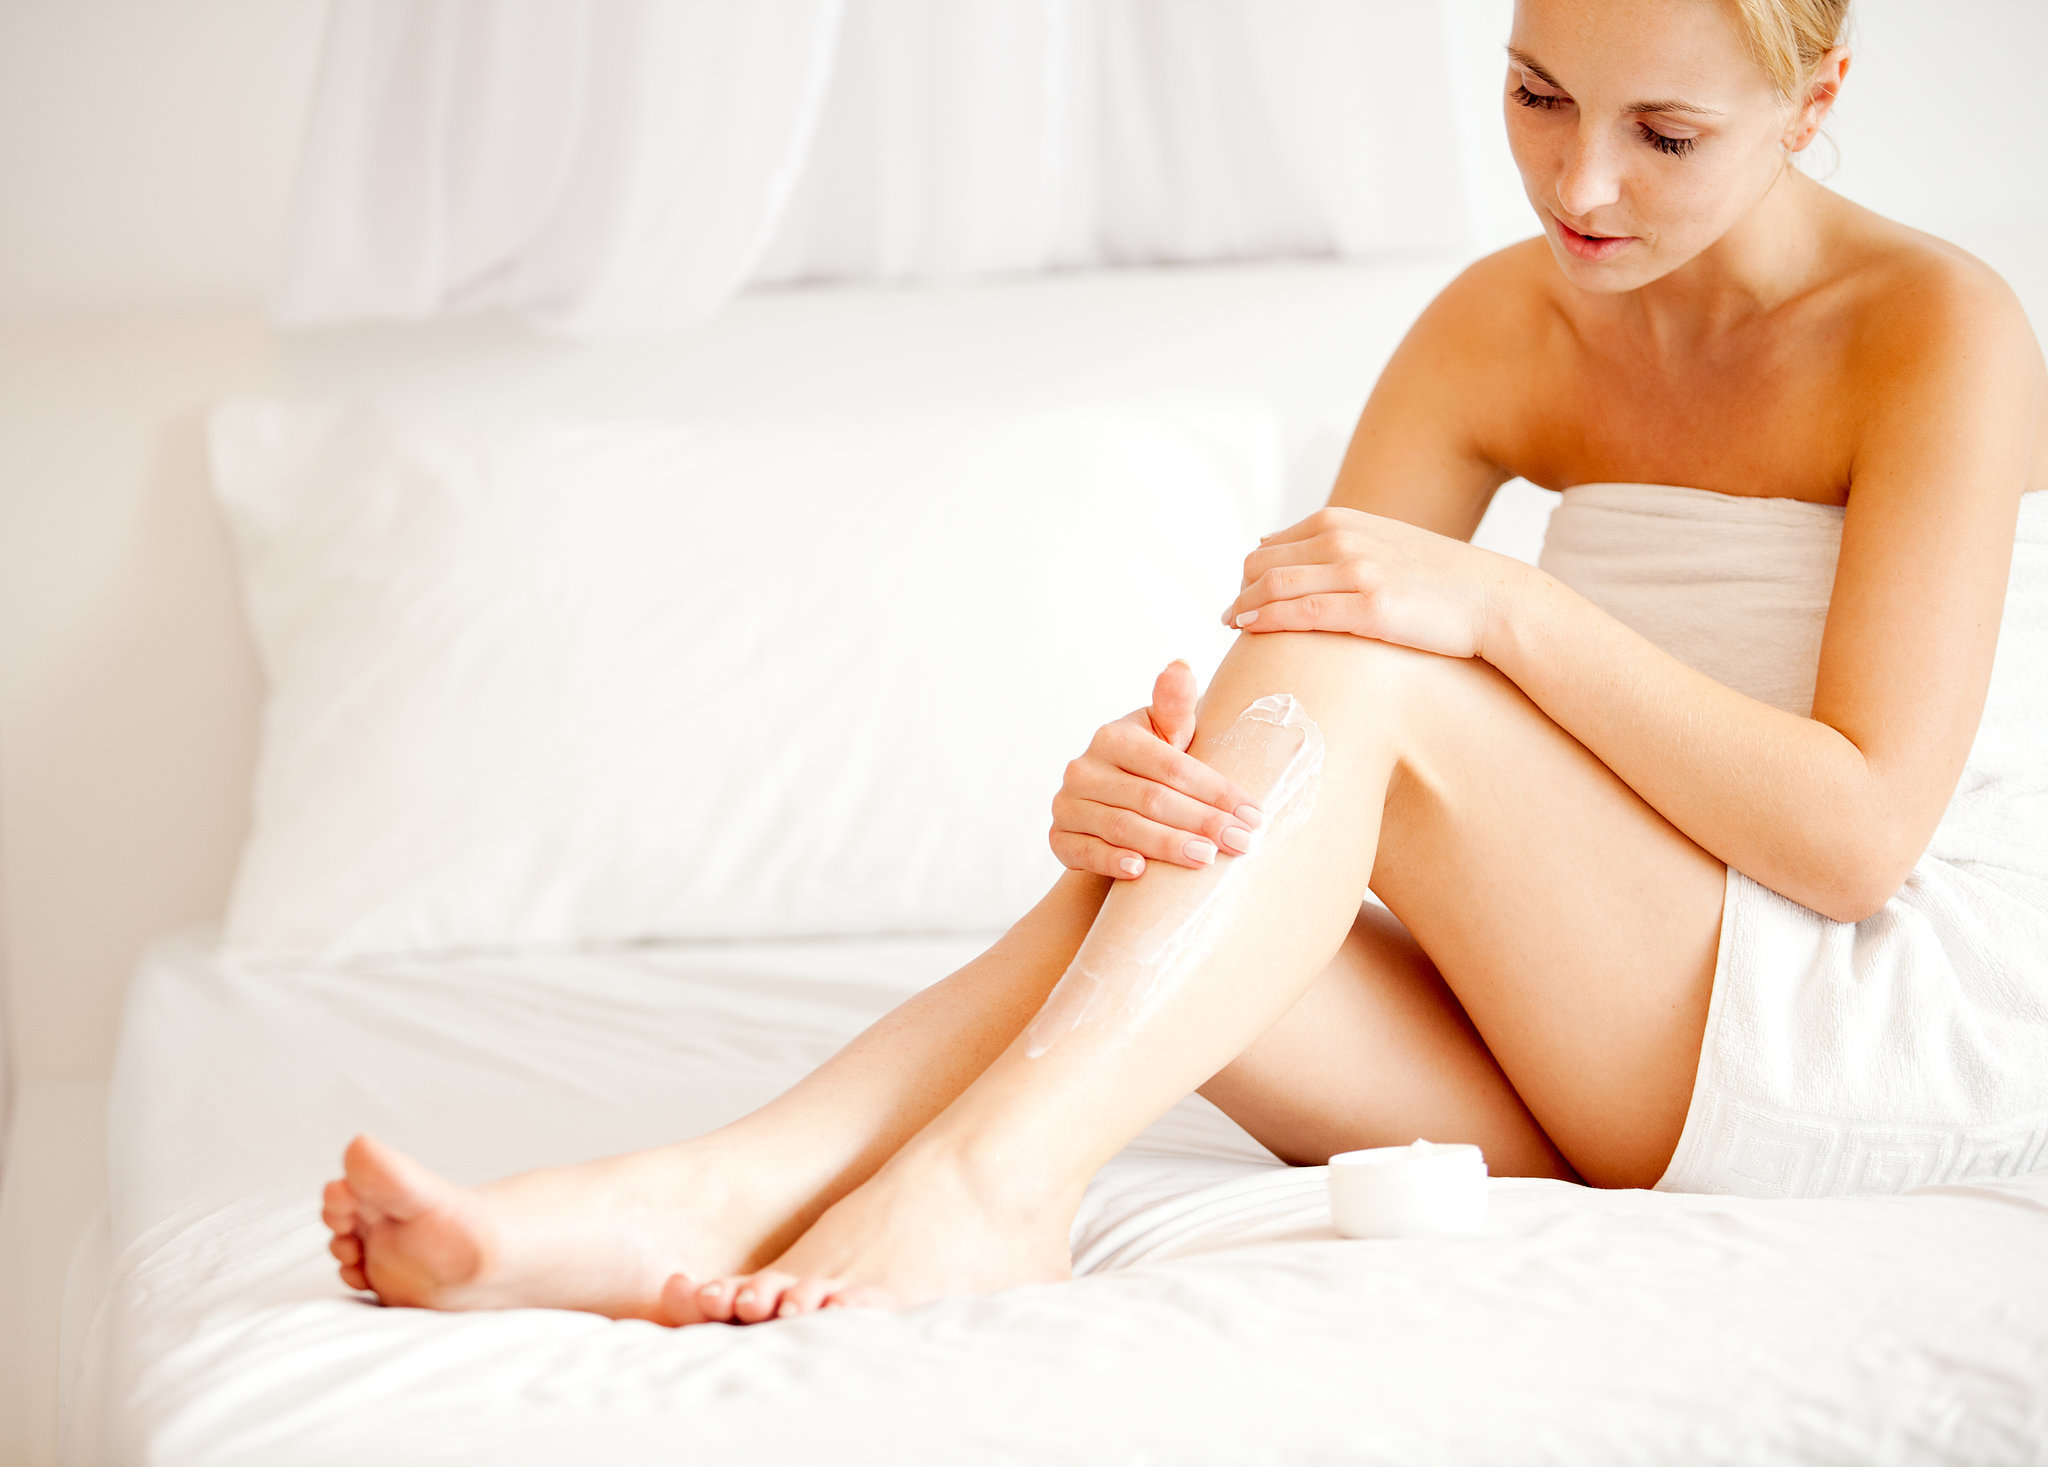 8 рекомендаций по уходу за кожей тела